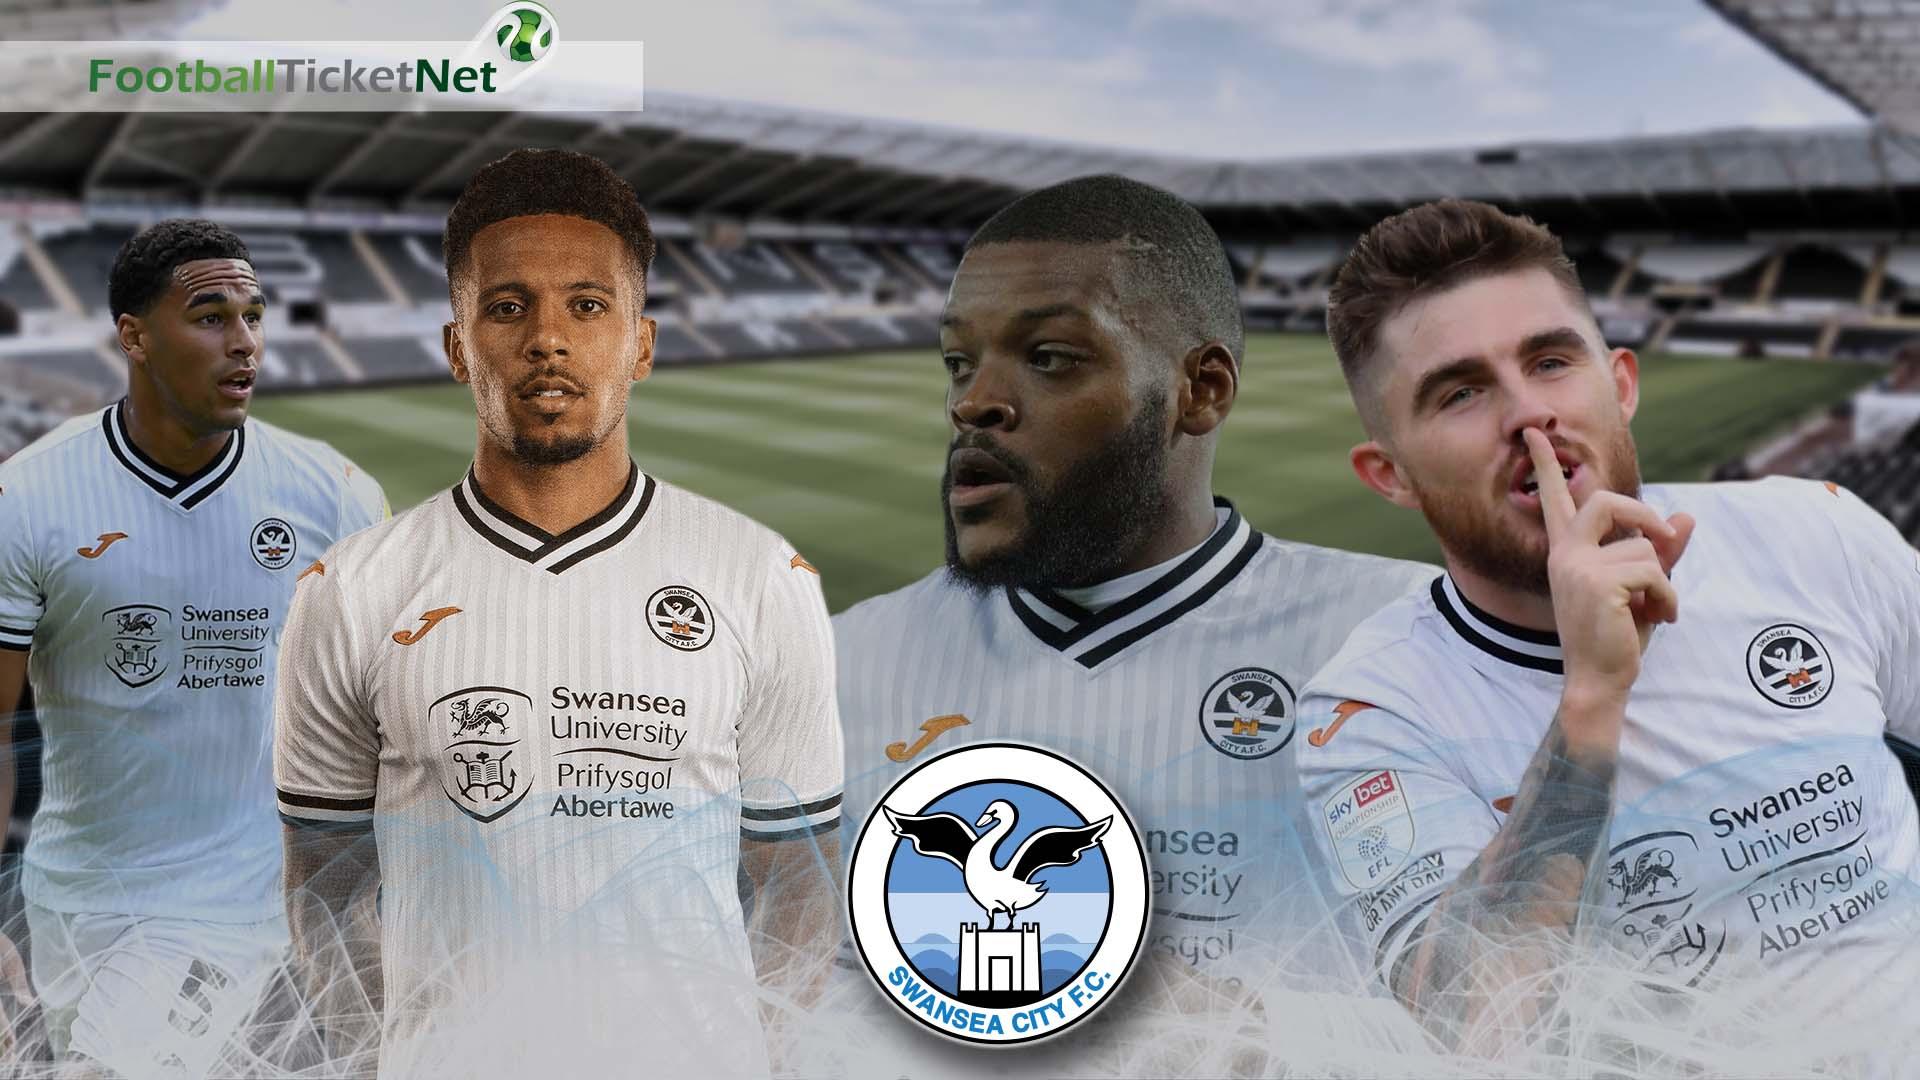 Buy Swansea City Football Tickets 2019 20 Football Ticket Net